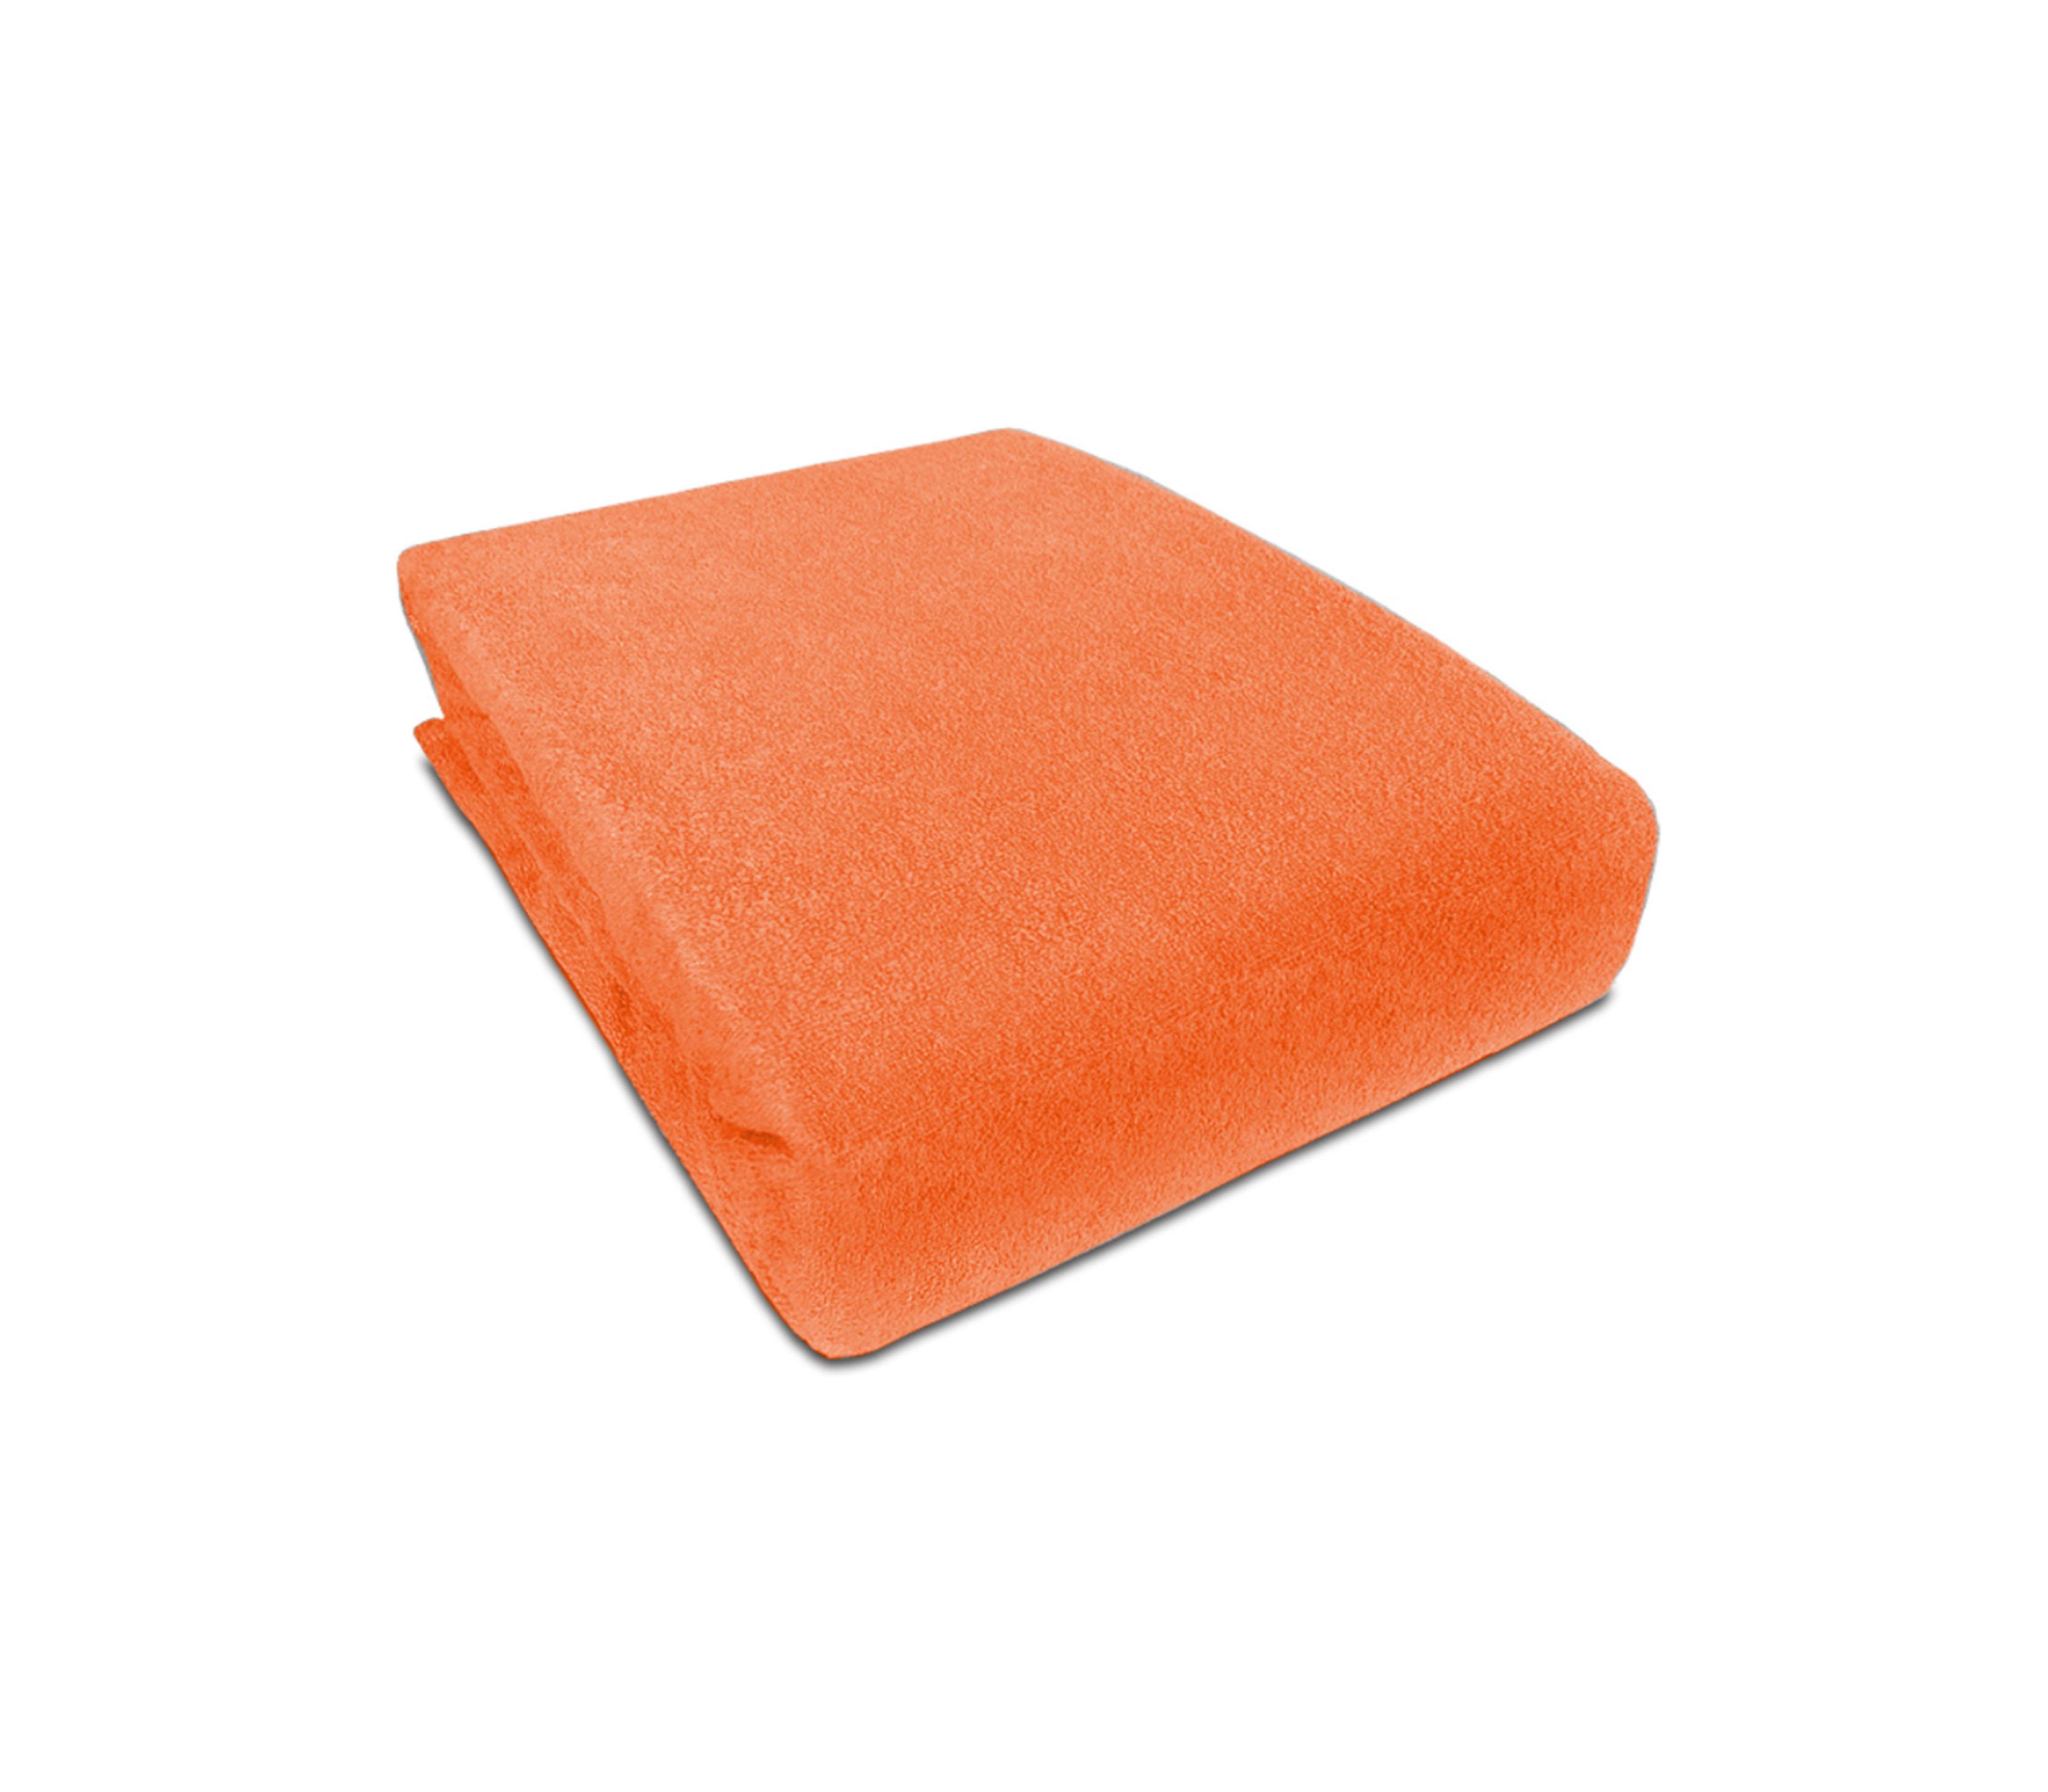 Aga prostěradlo FROTÉ 160X200 cm Barva prostěradla: Oranžová